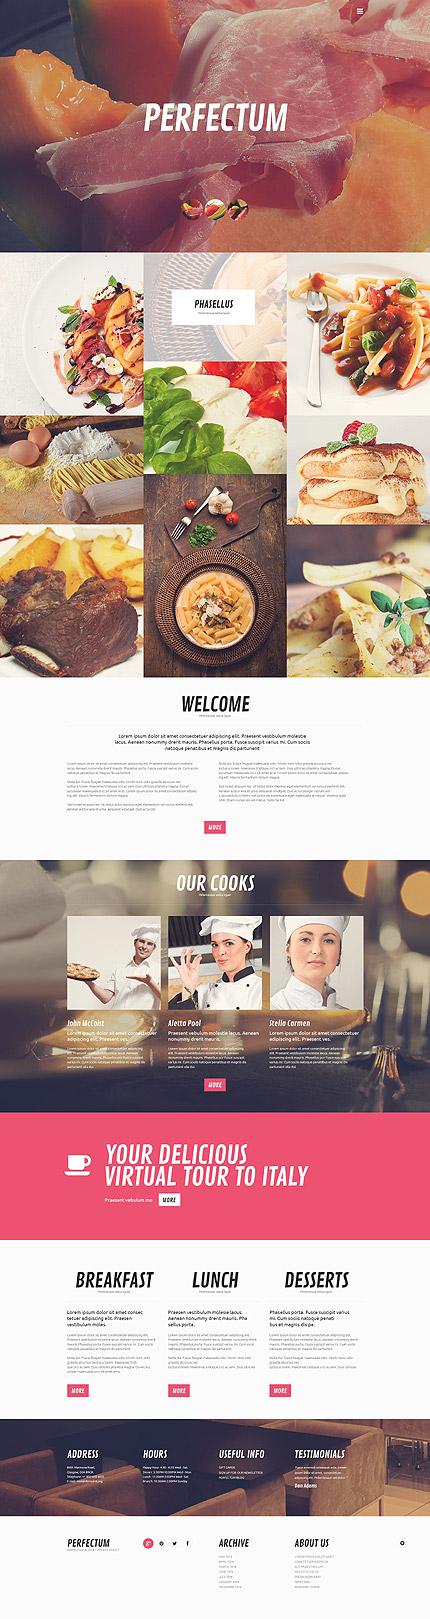 Cafe and Restaurant WordPress Theme